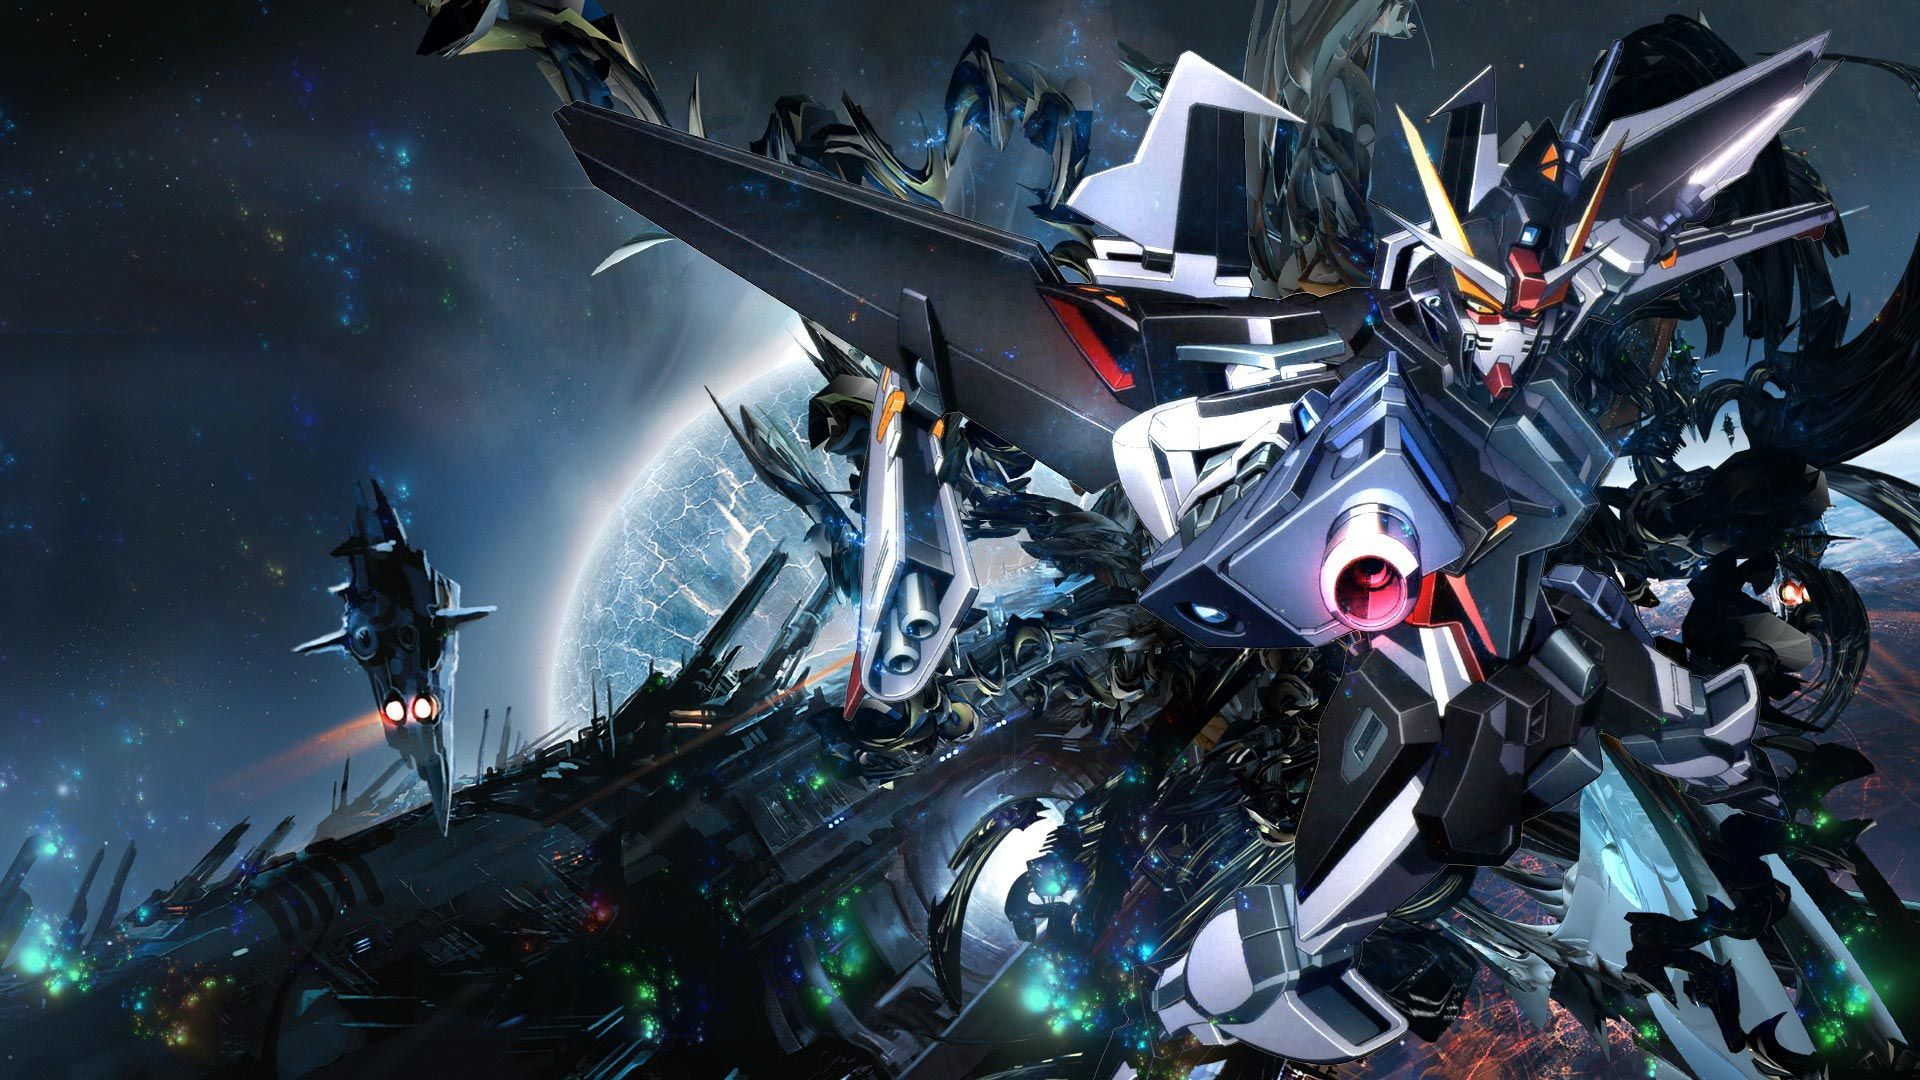 Gundam Wallpaper Hd With Images Gundam Wallpapers Anime